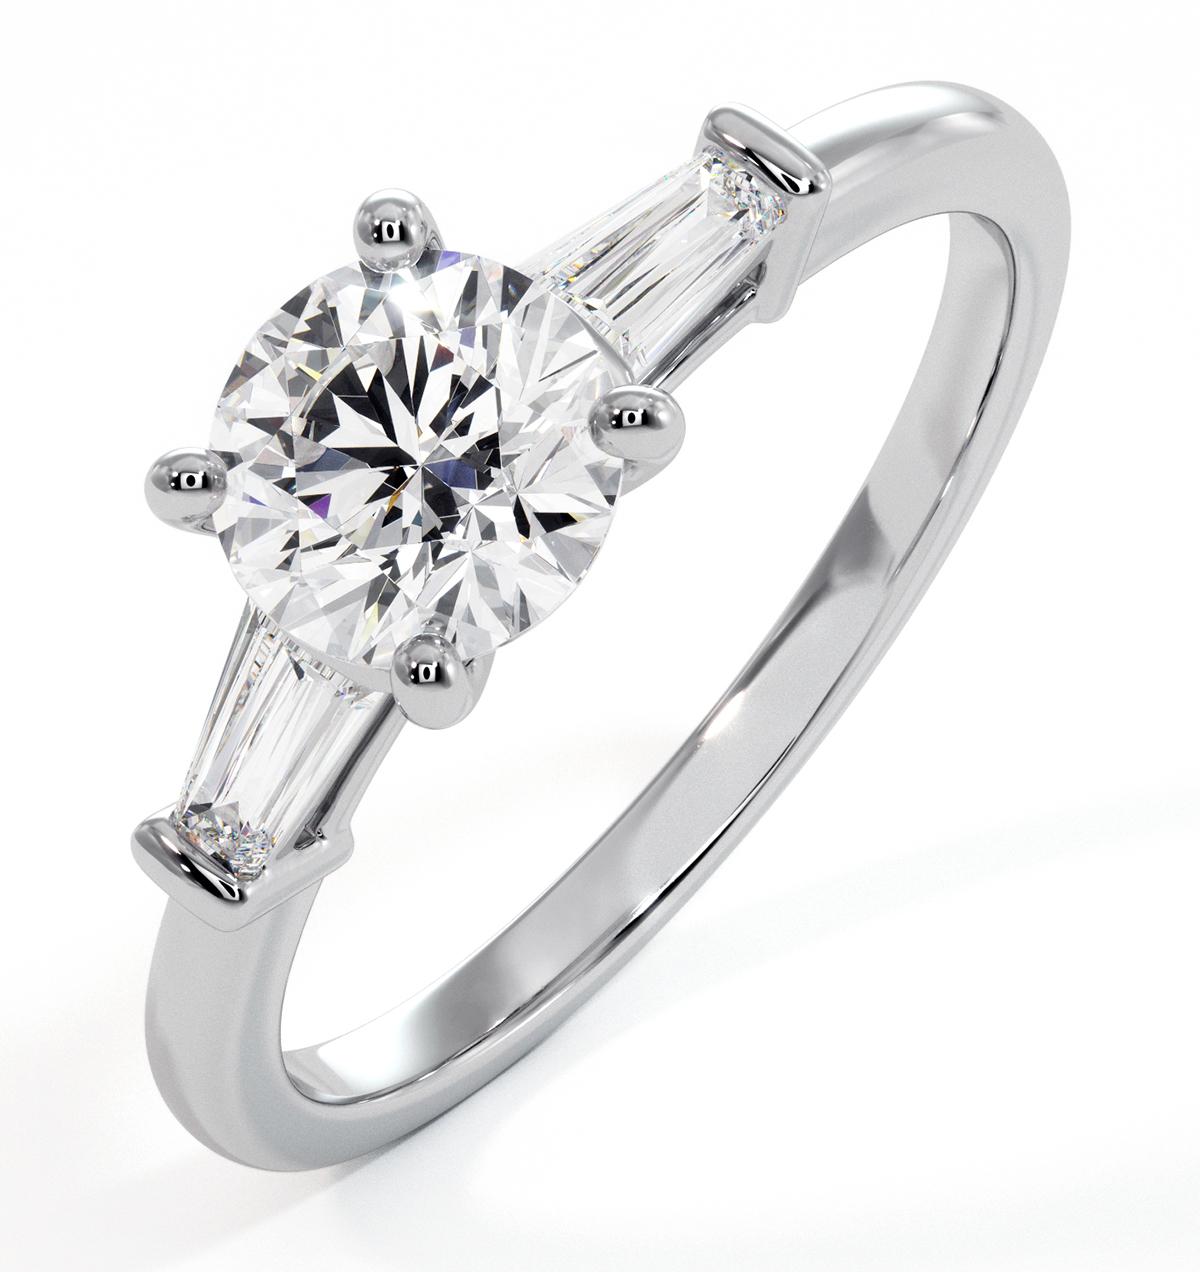 Isadora GIA Diamond Engagement Ring Platinum 0.90ct G/VS1 - image 1